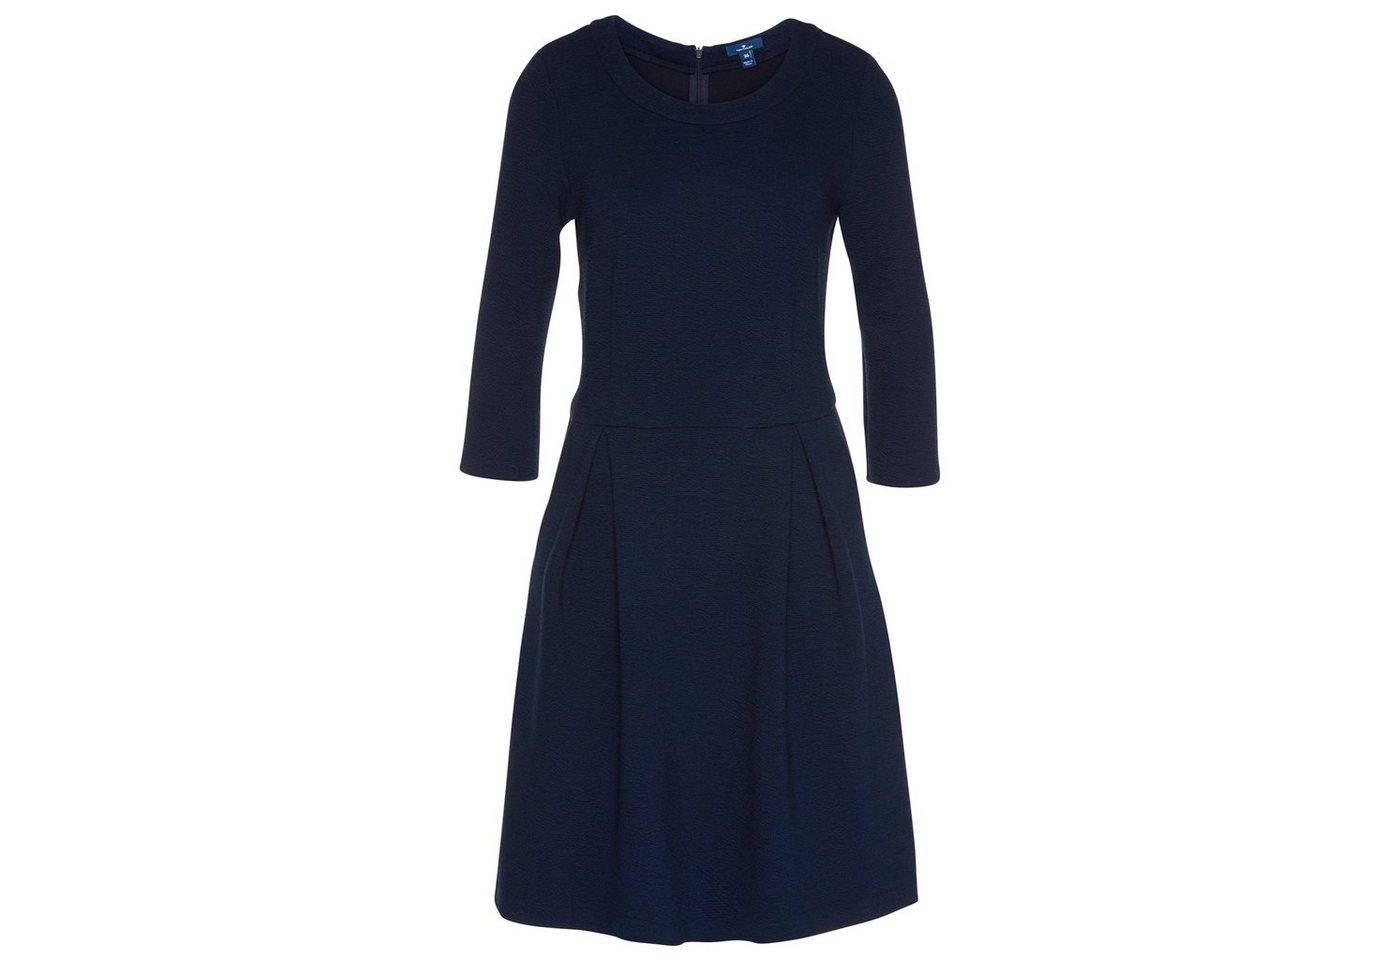 Tom Tailor jurk »elegante jurk met structuur« blauw